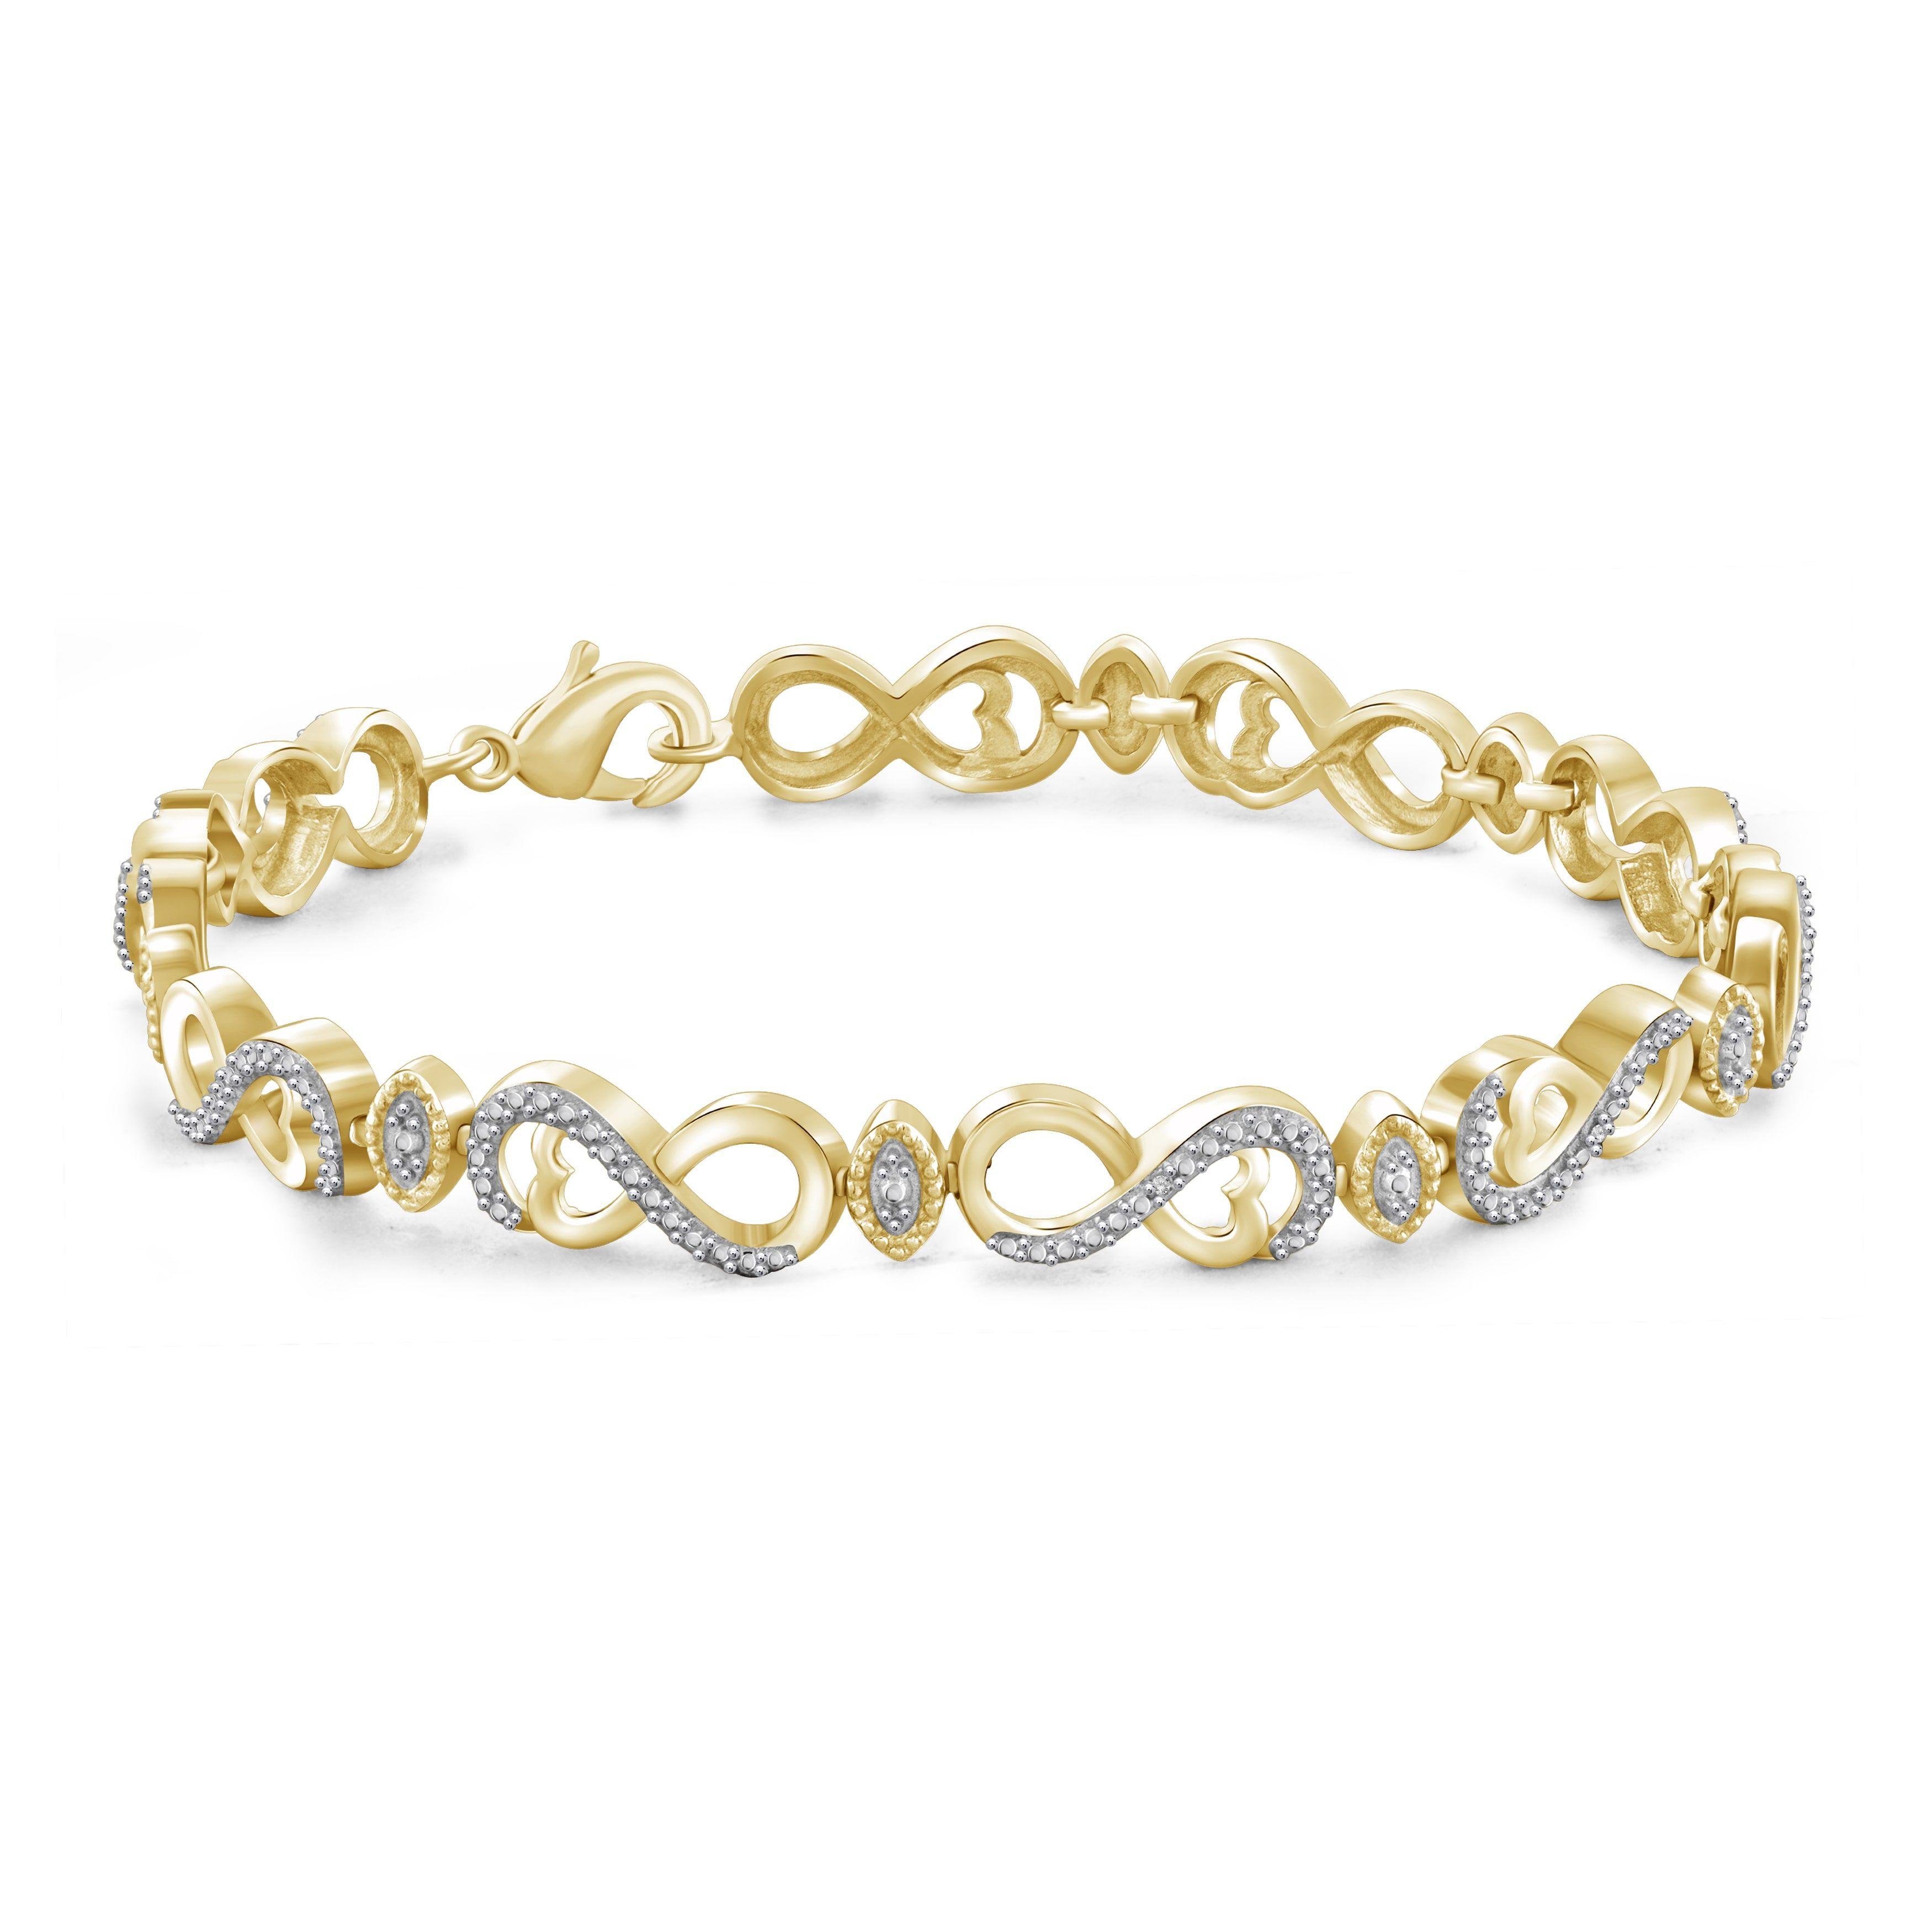 rose length zm with zirconia cubic adjustable gold itm k bracelet infinity